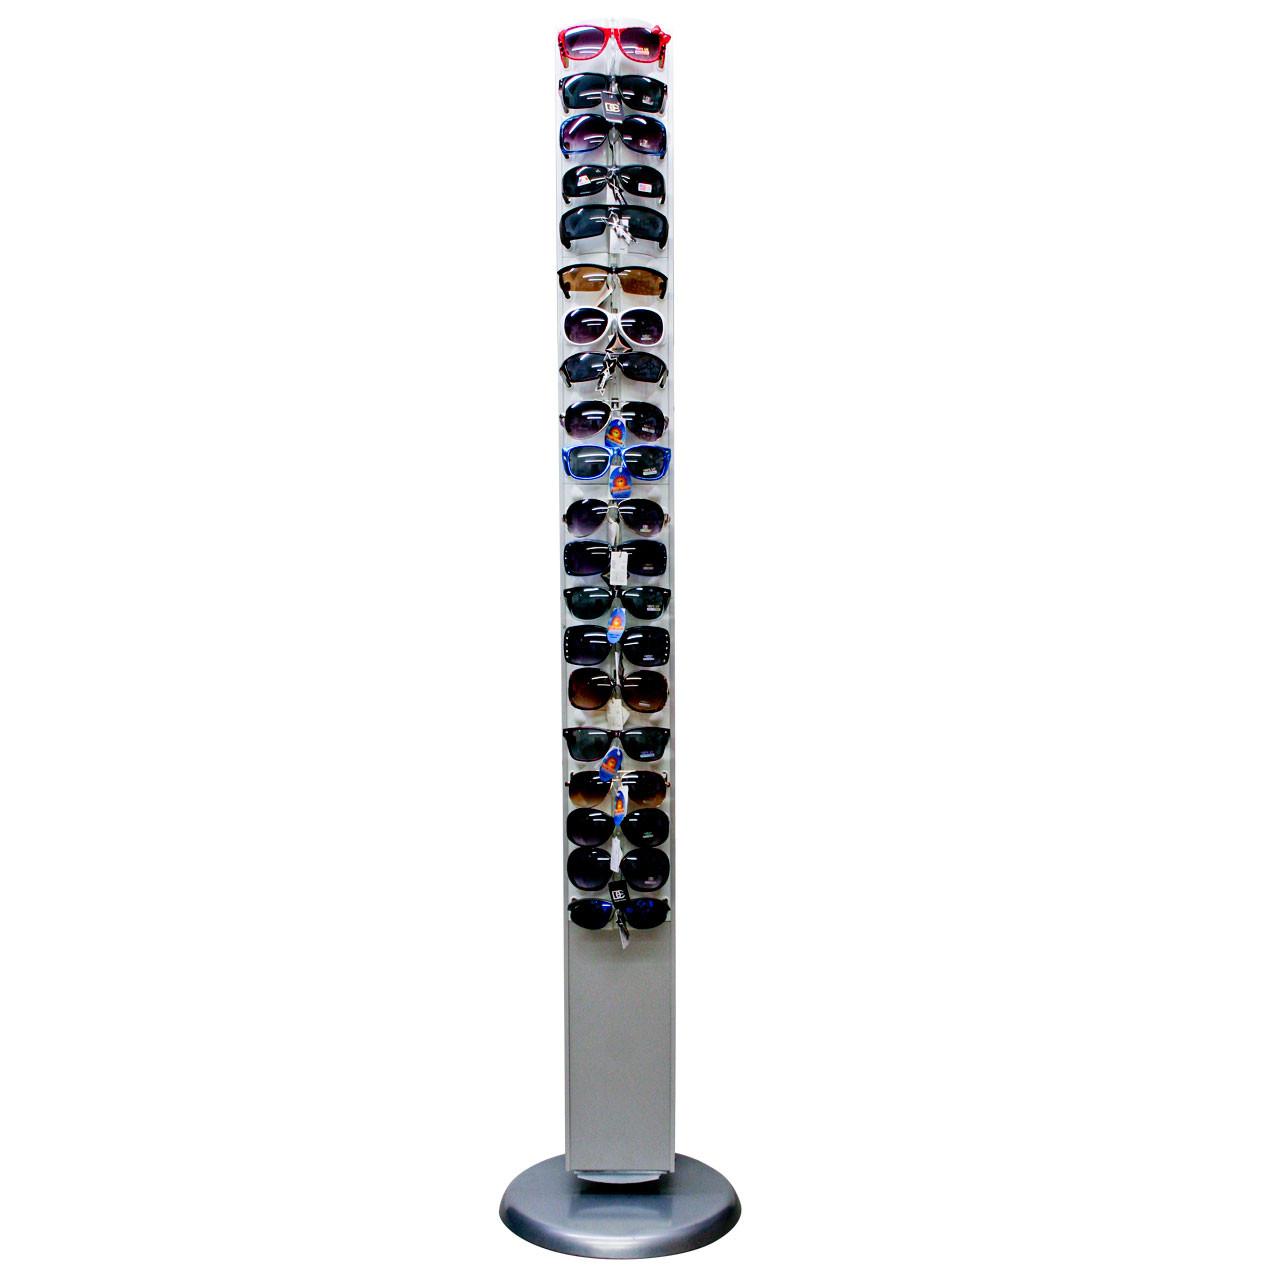 Wholesale Floor Model Rotating Sunglass Display (1 pc.) Holds 40 Pair